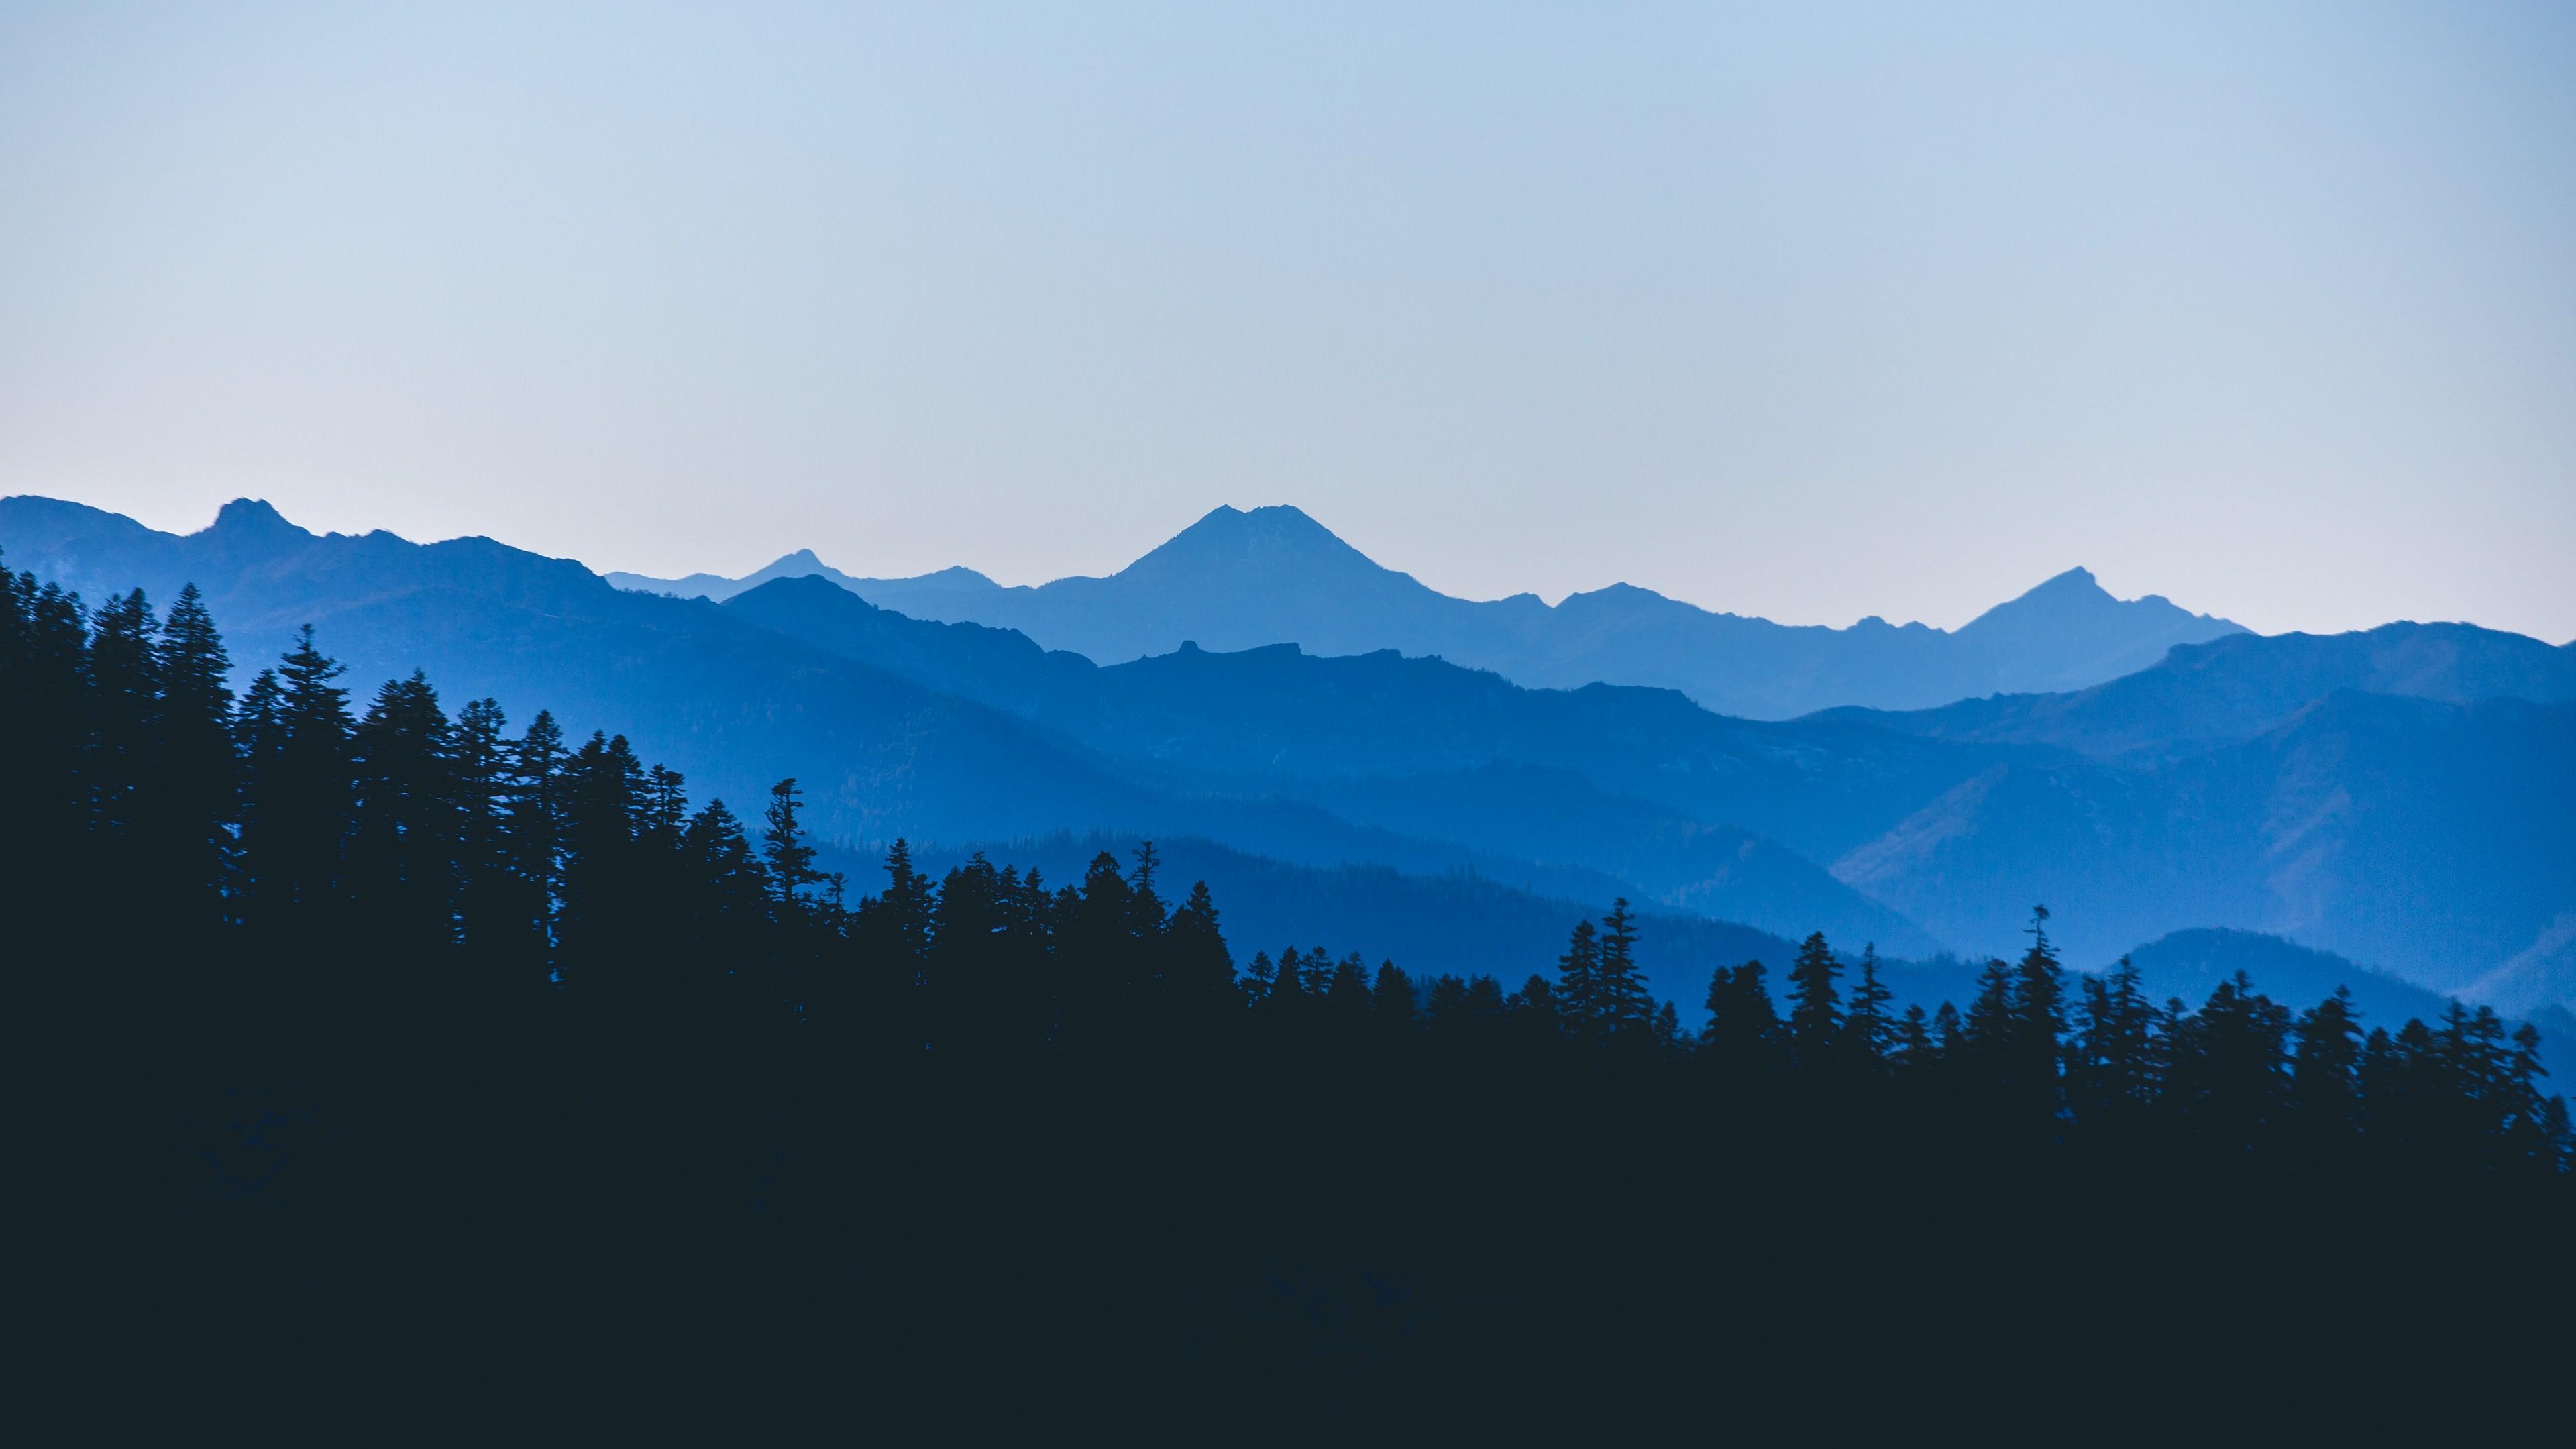 Nature mountain forest landscape fog lake ultrahd 4k wallpaper wallpaper |  | 231332 | WallpaperUP